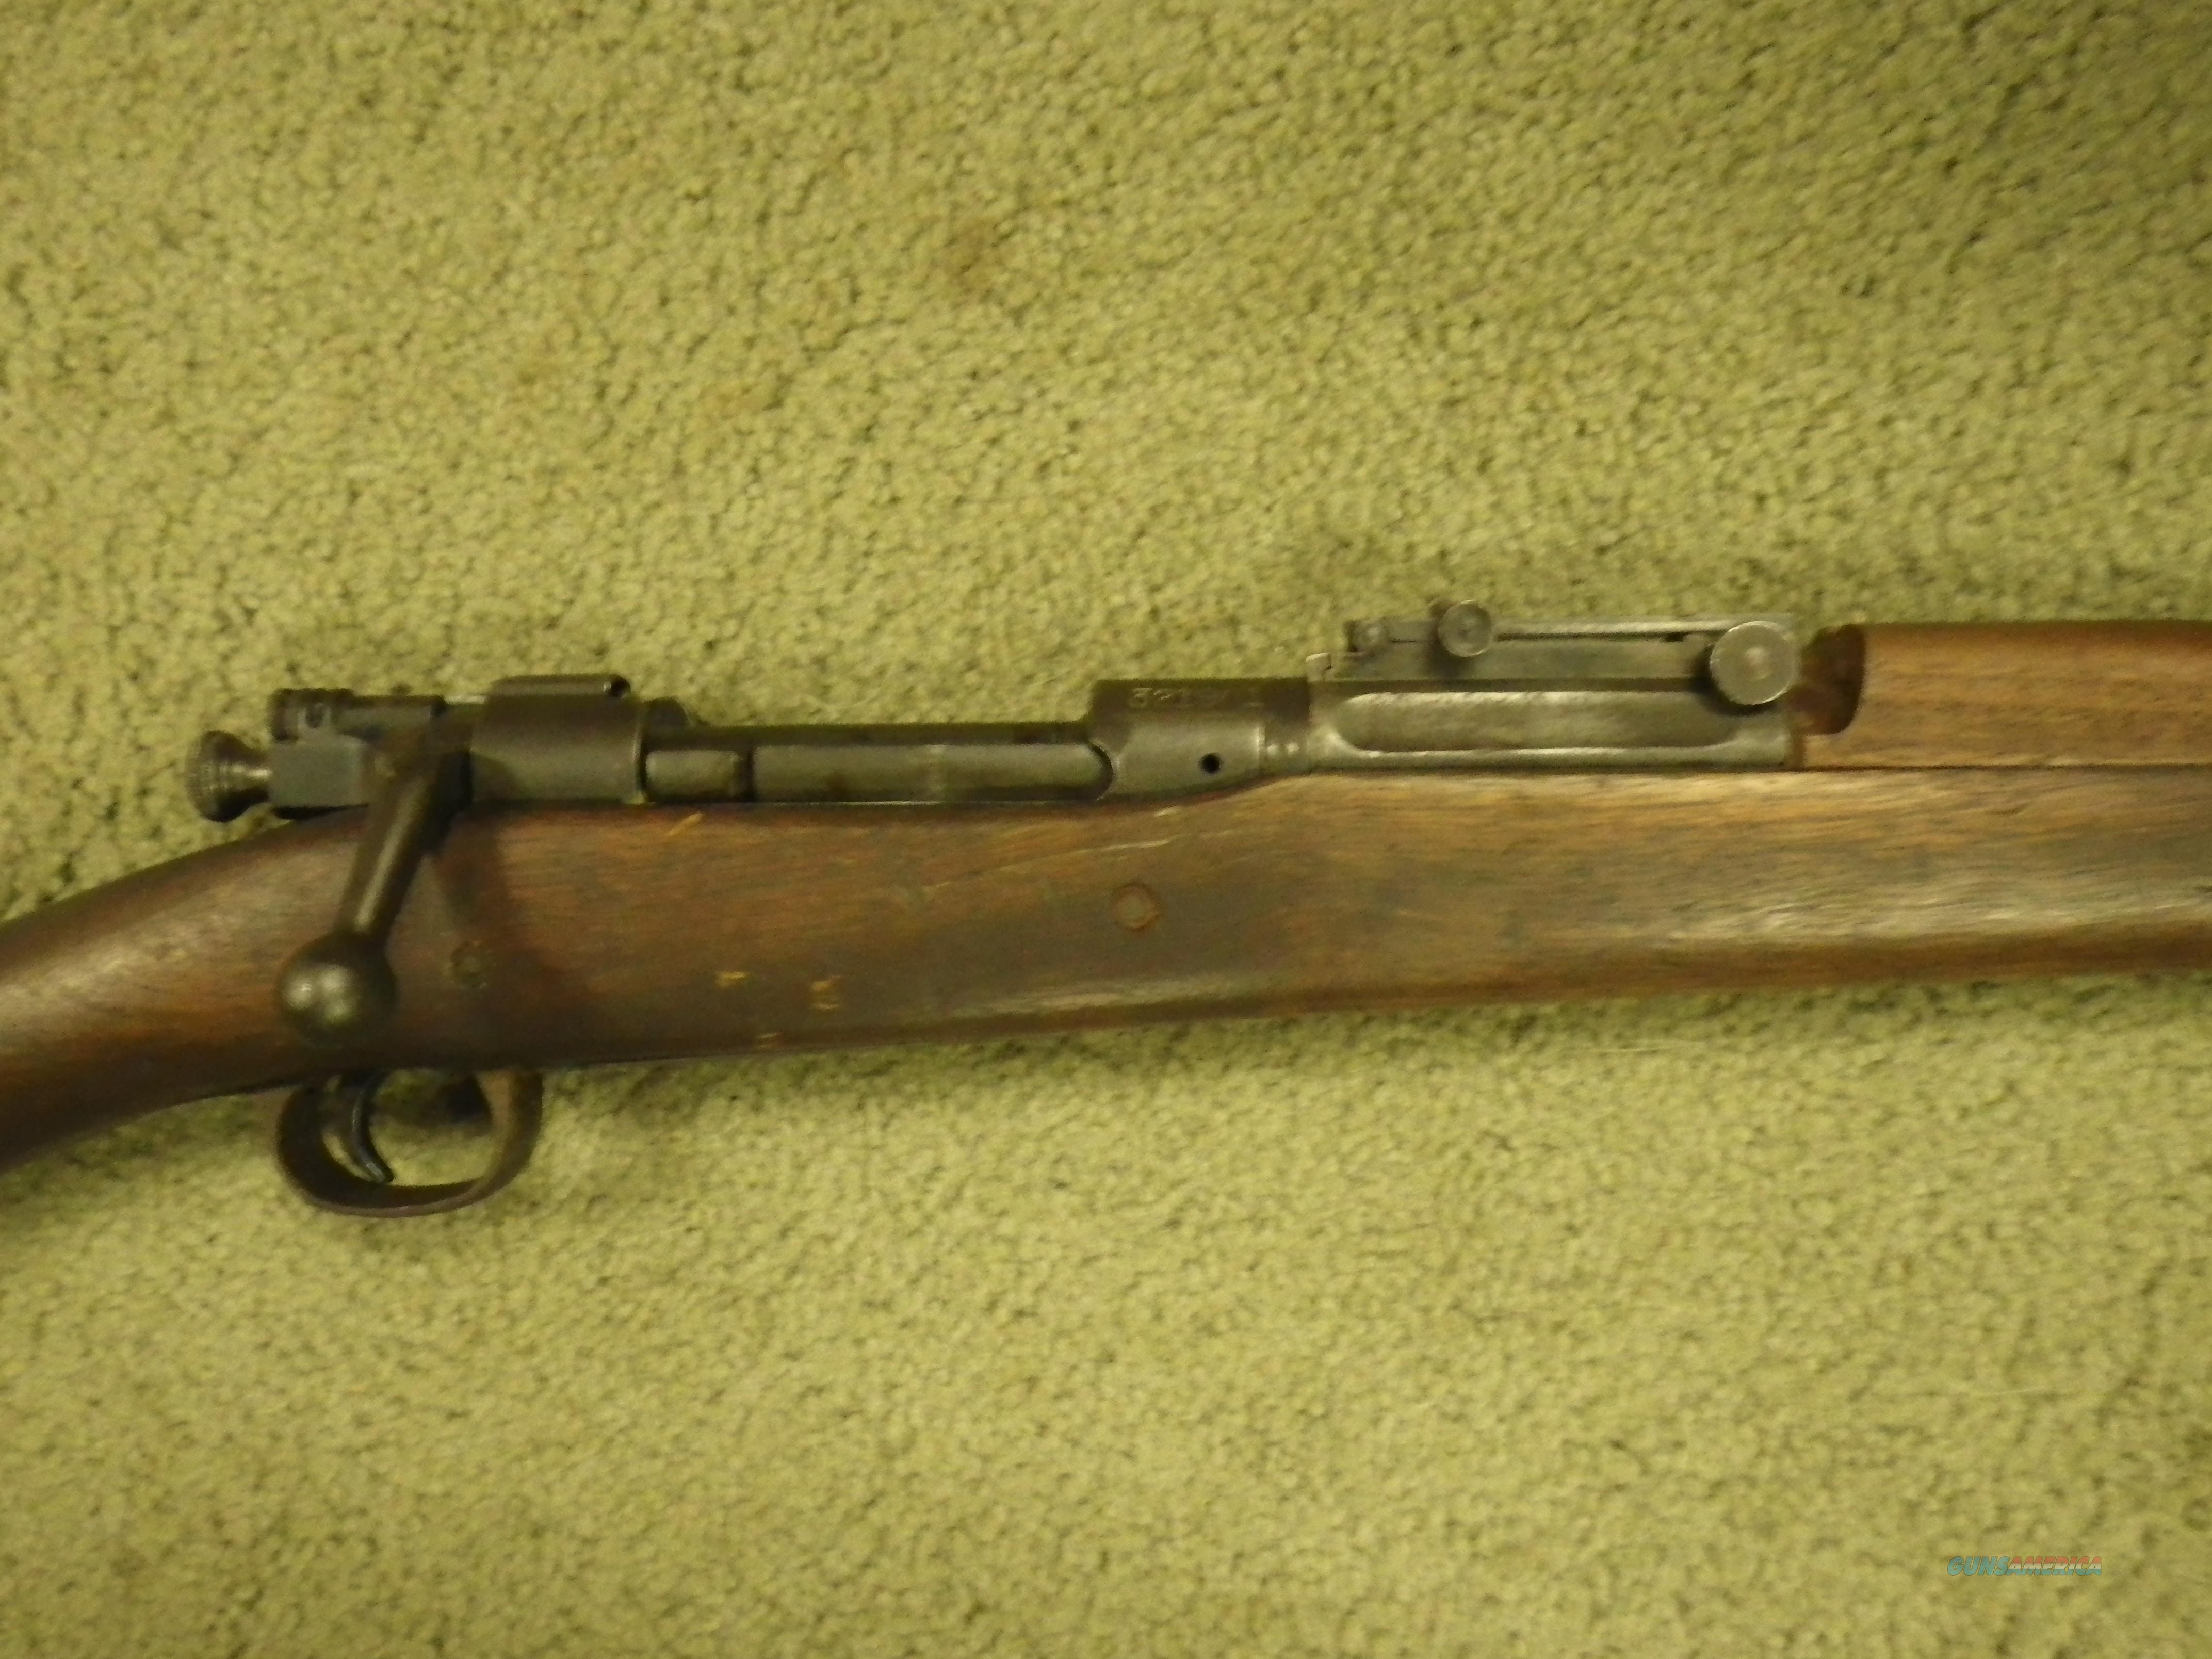 buy 1903 springfield rifle - psychologyarticles info